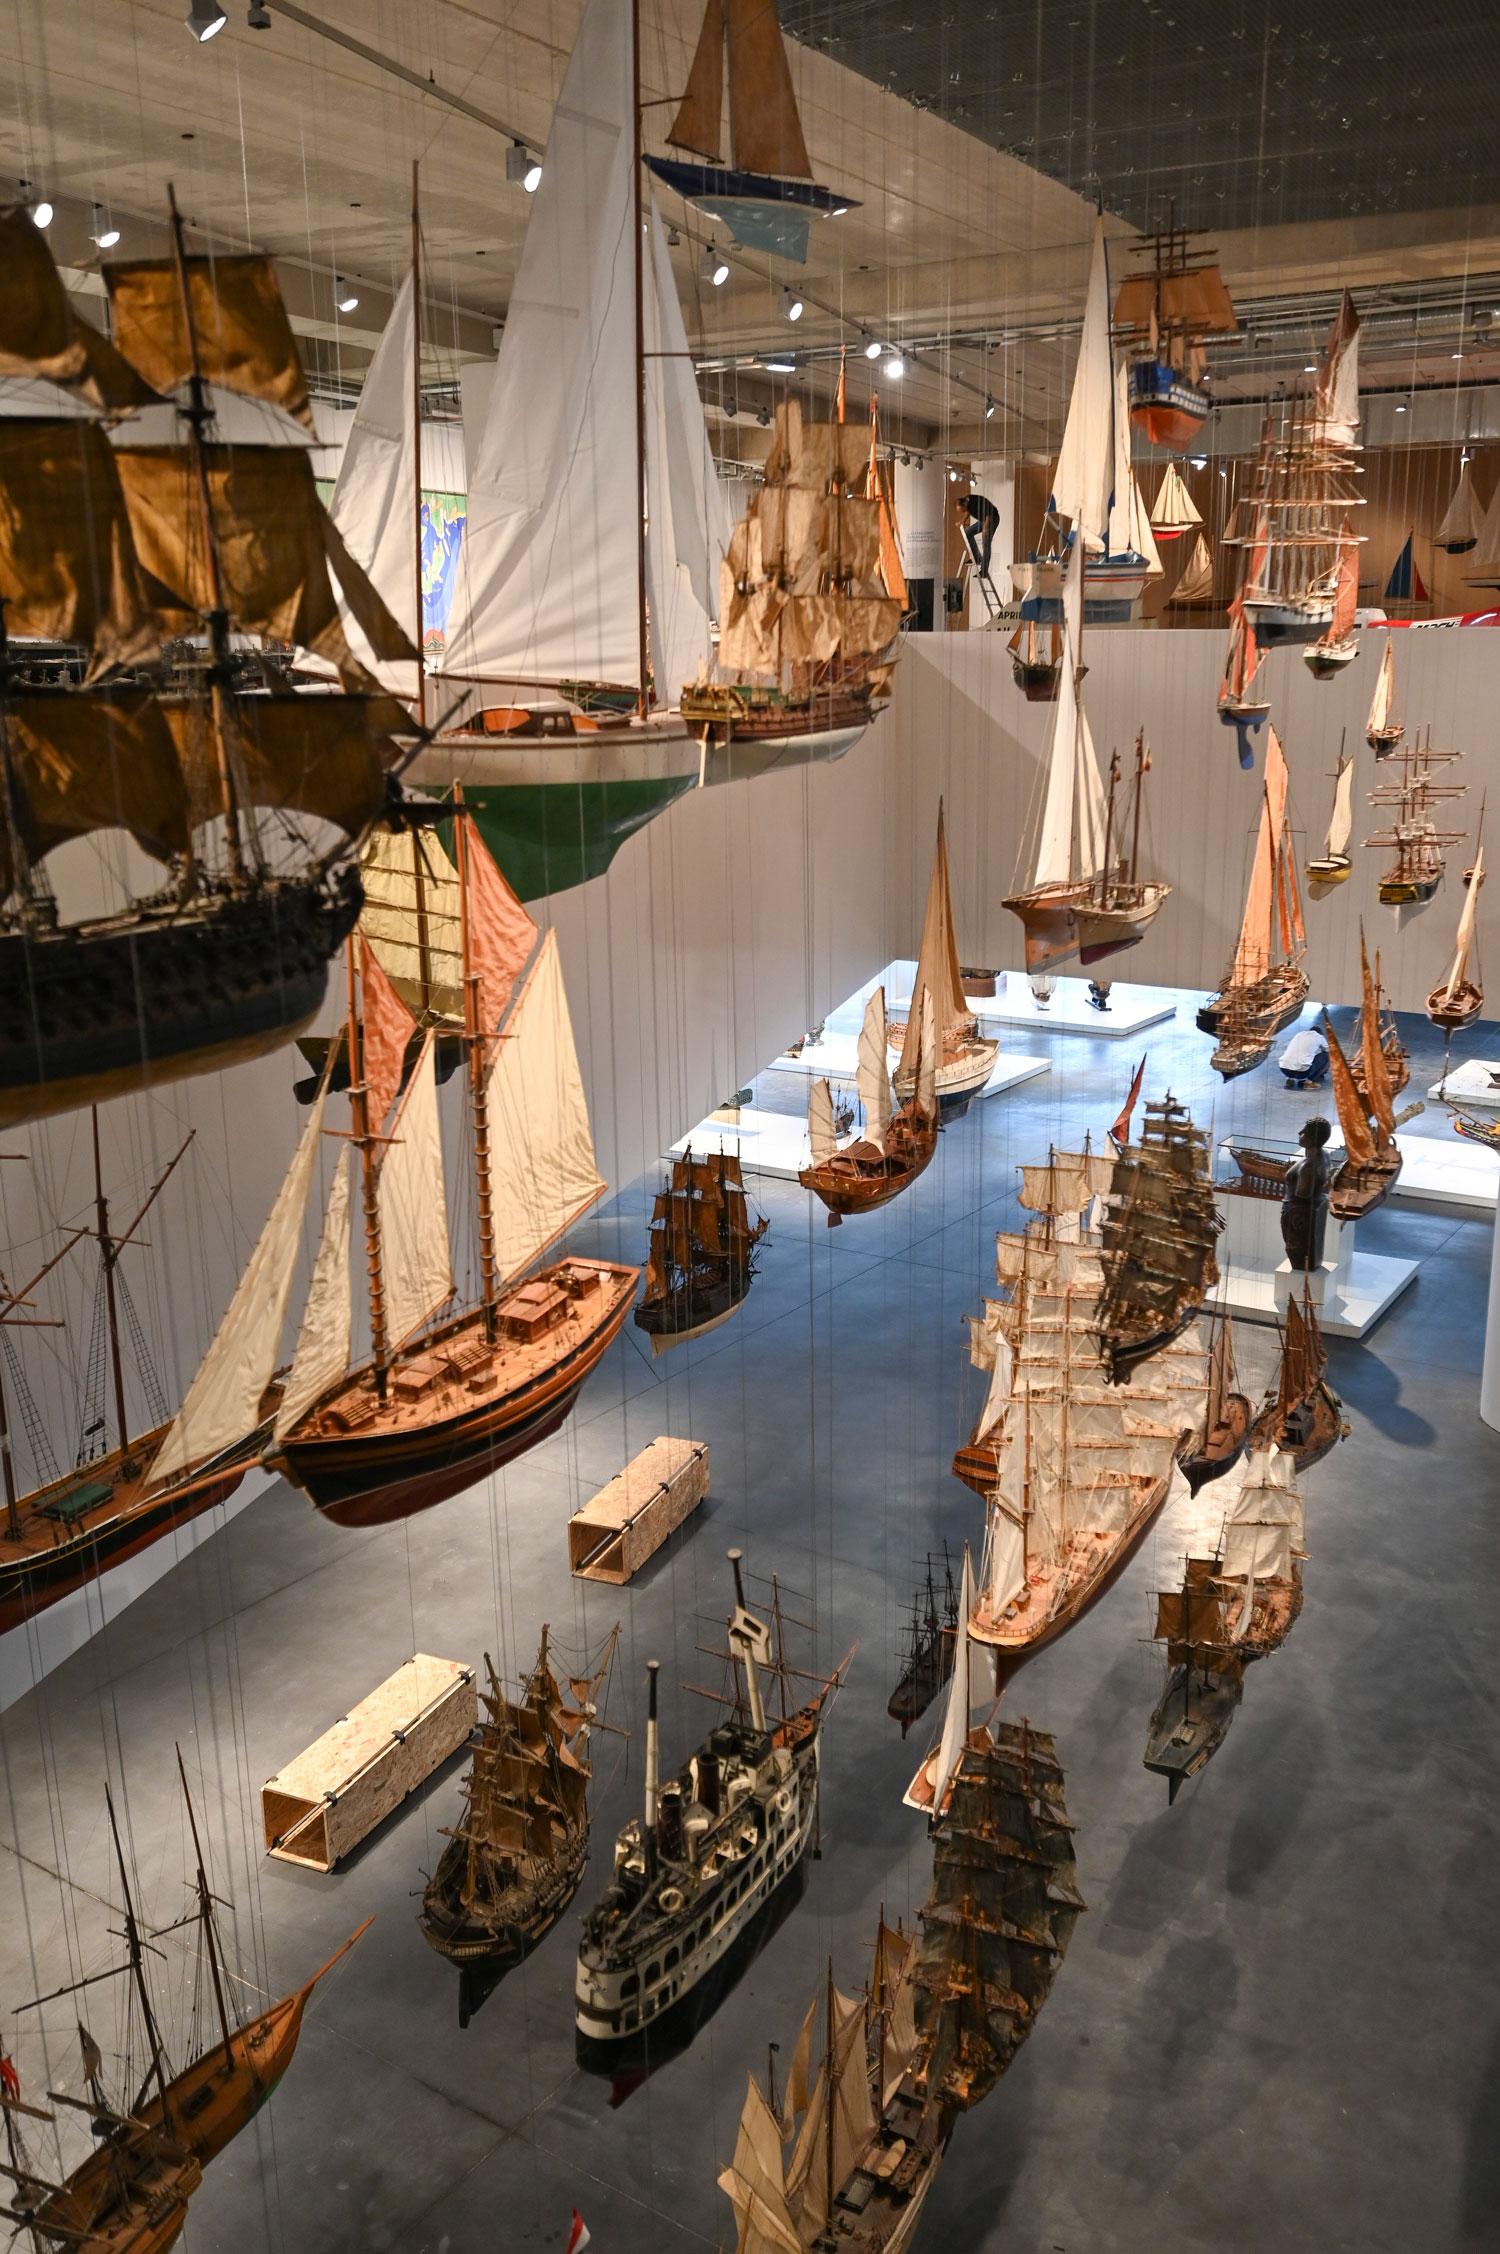 Bienvenue à bord du Musée Mer Marine